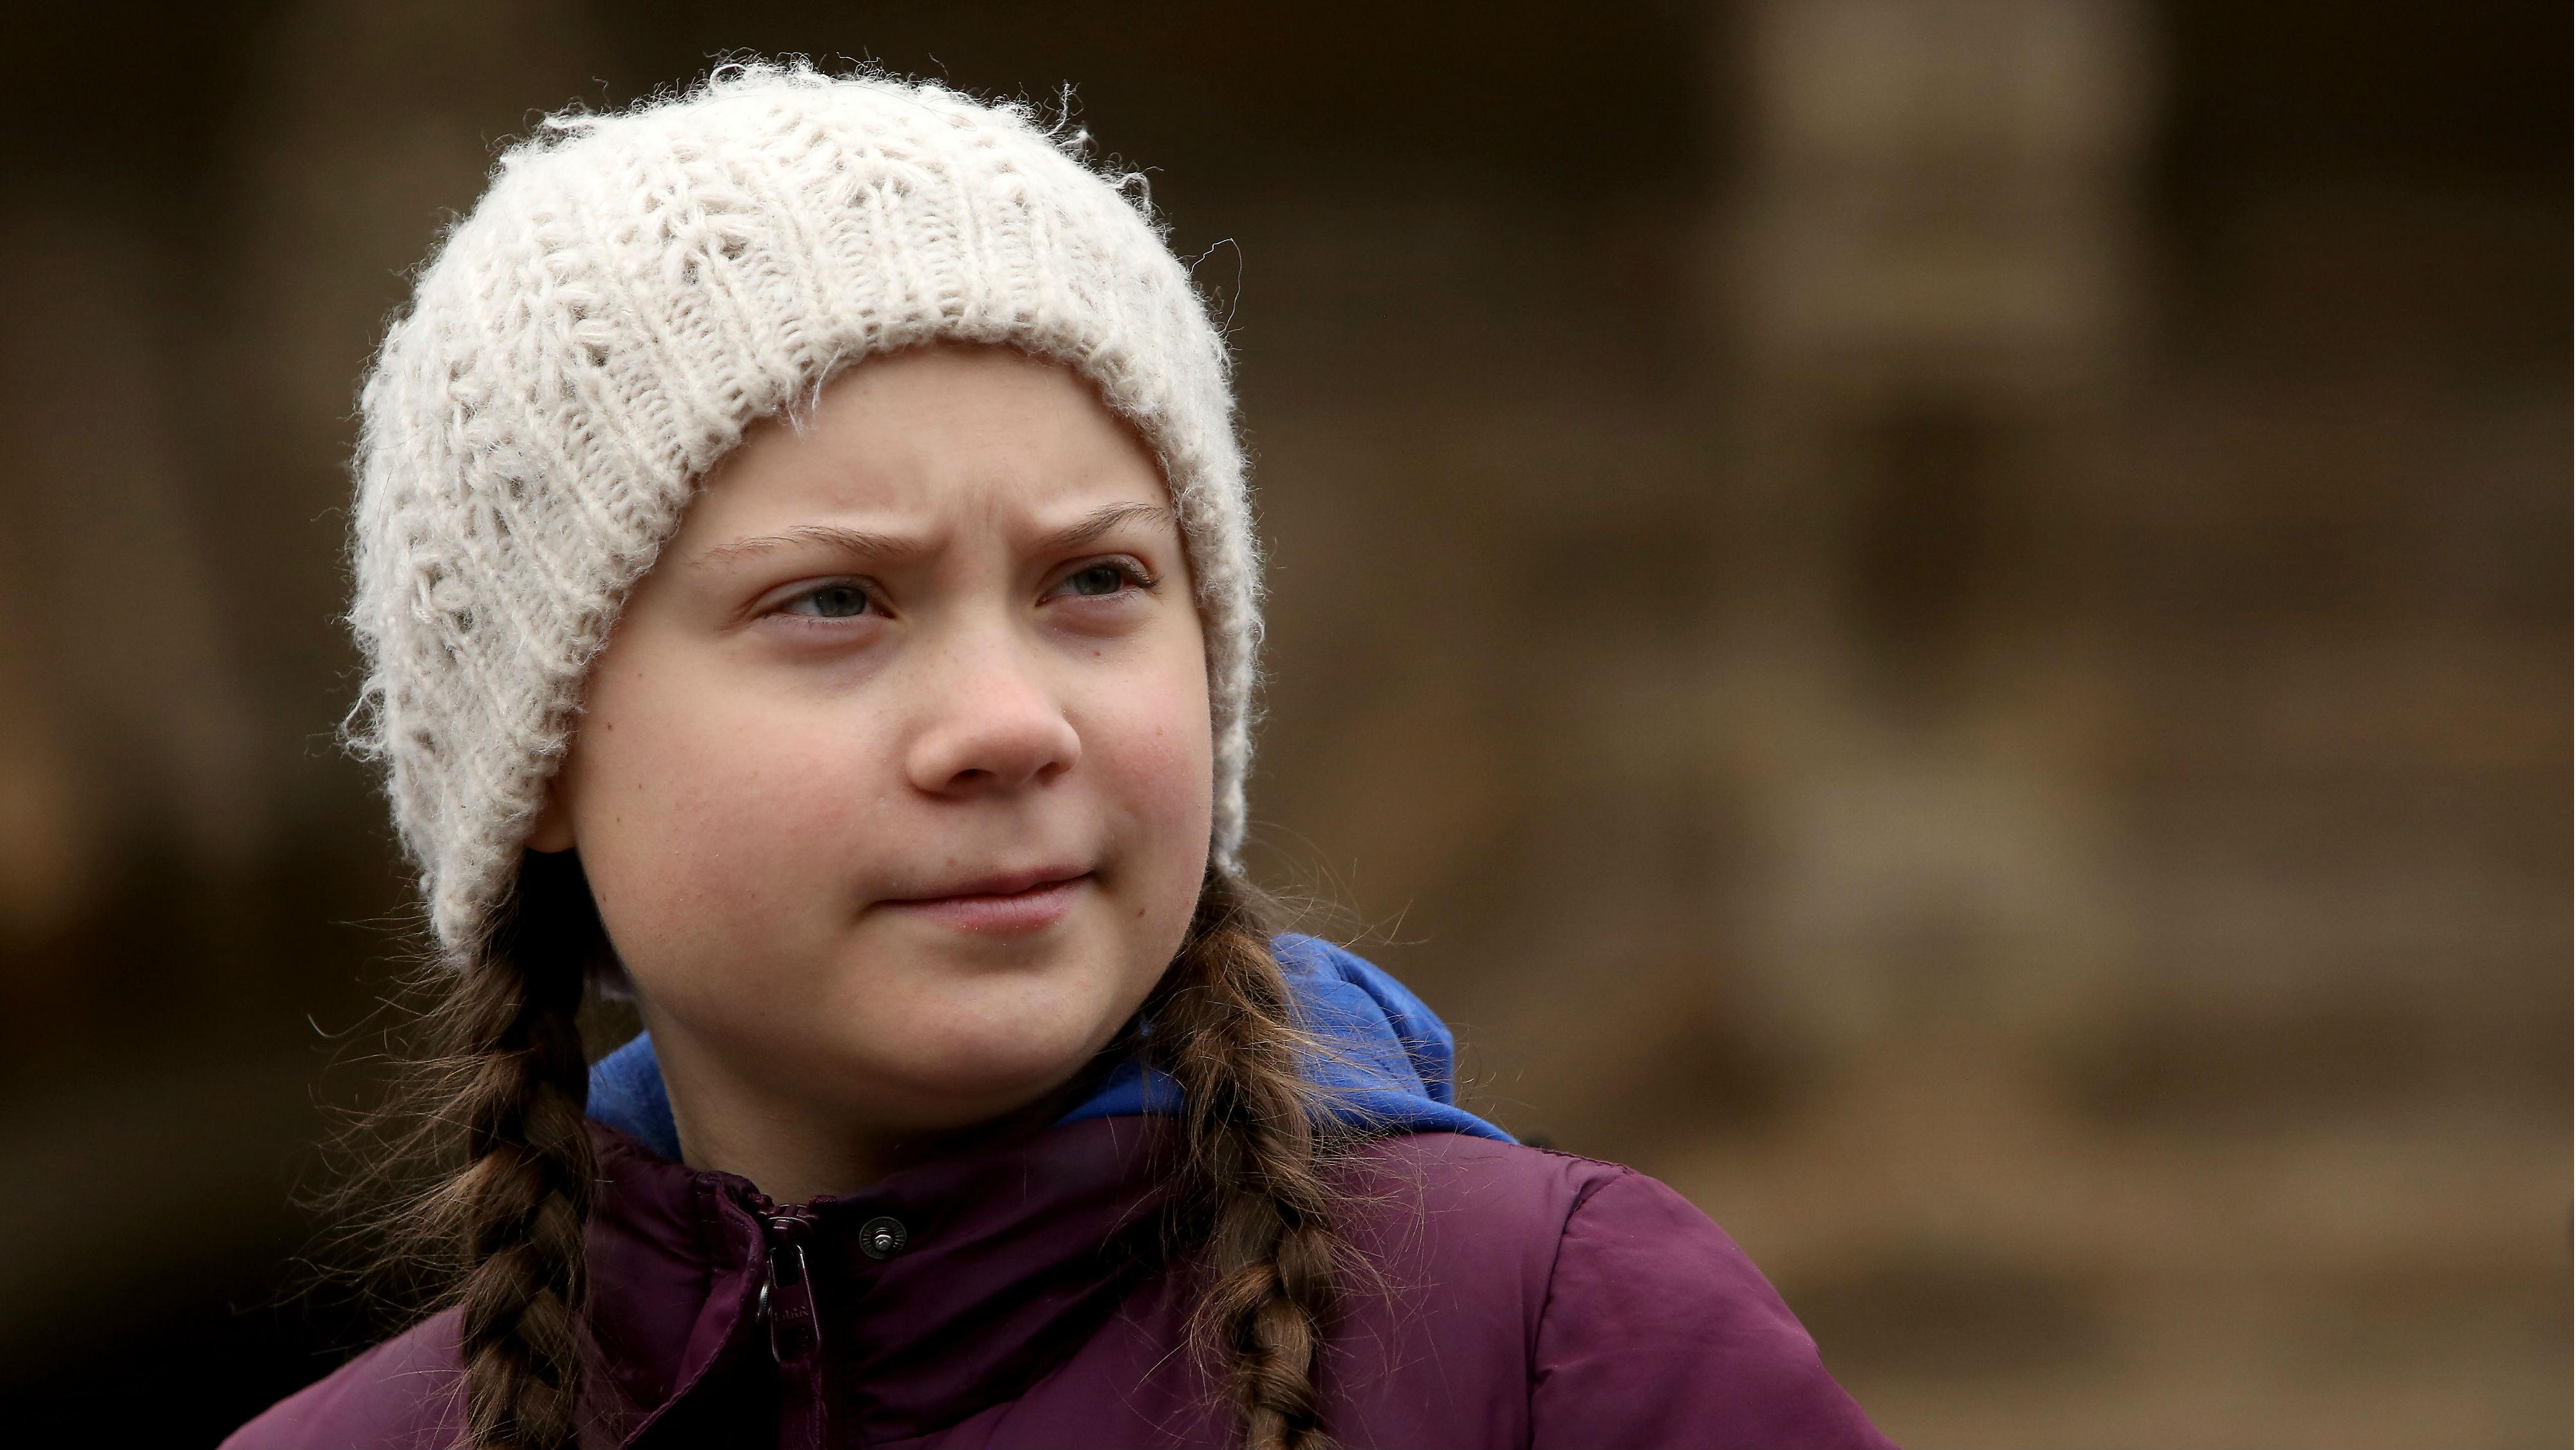 Swedish climate activist Greta Thunberg nominated for Nobel Peace Prize